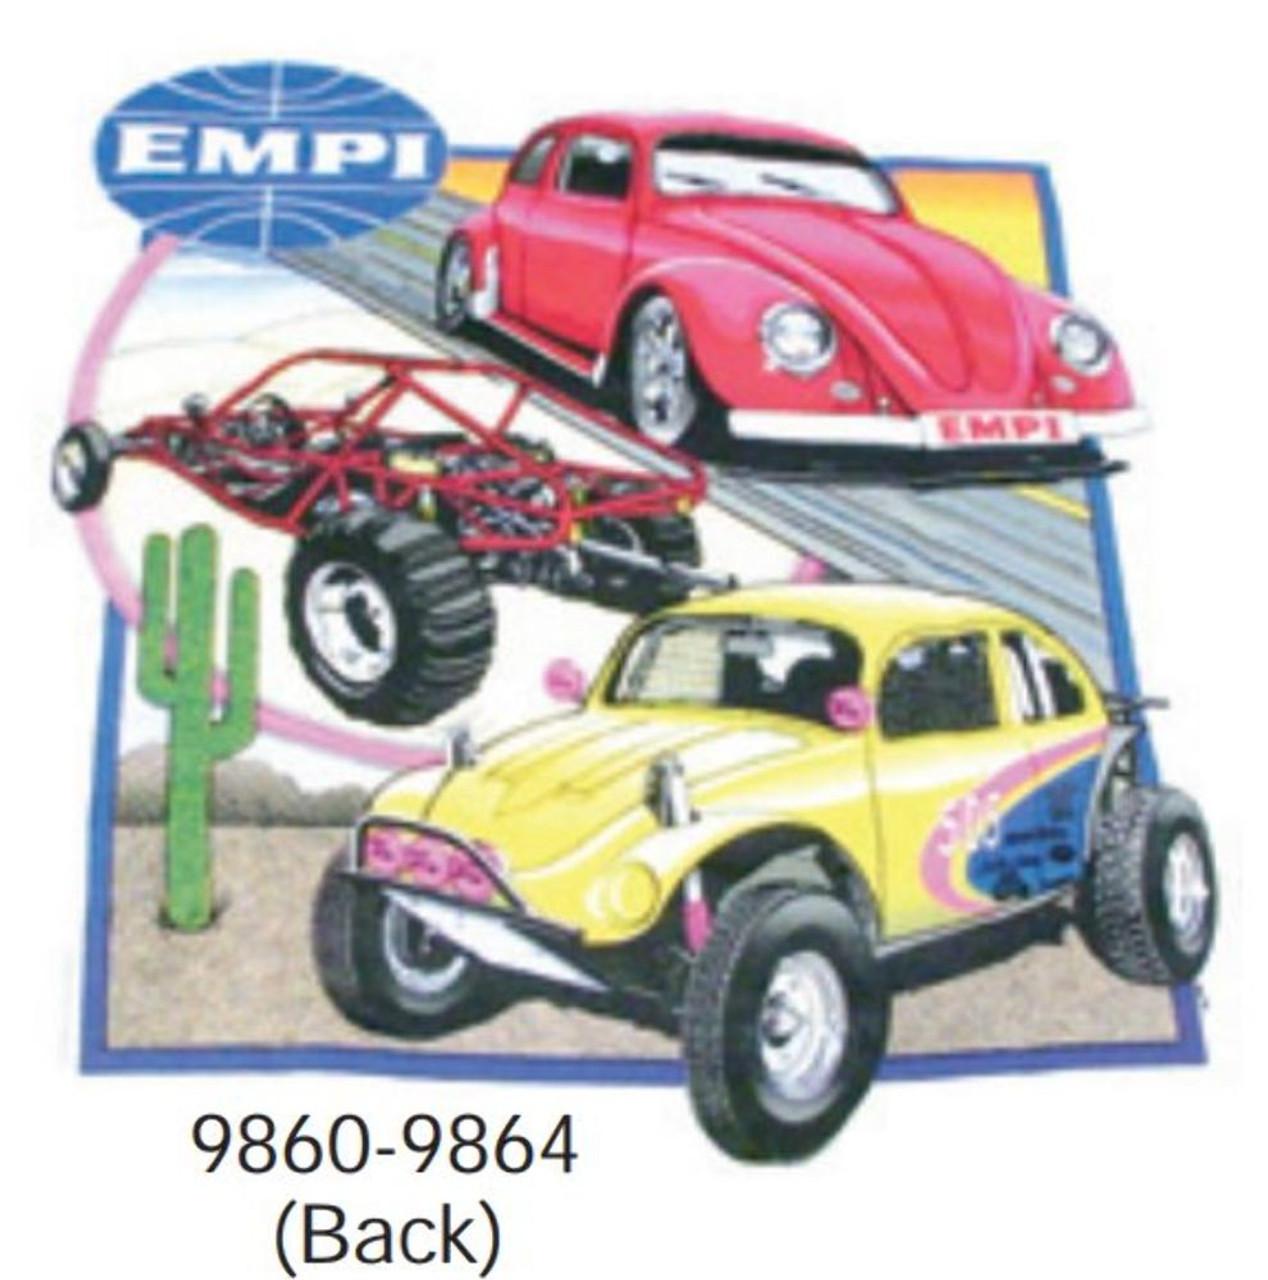 00-9864-0 EMPI T-SHIRT, XXL